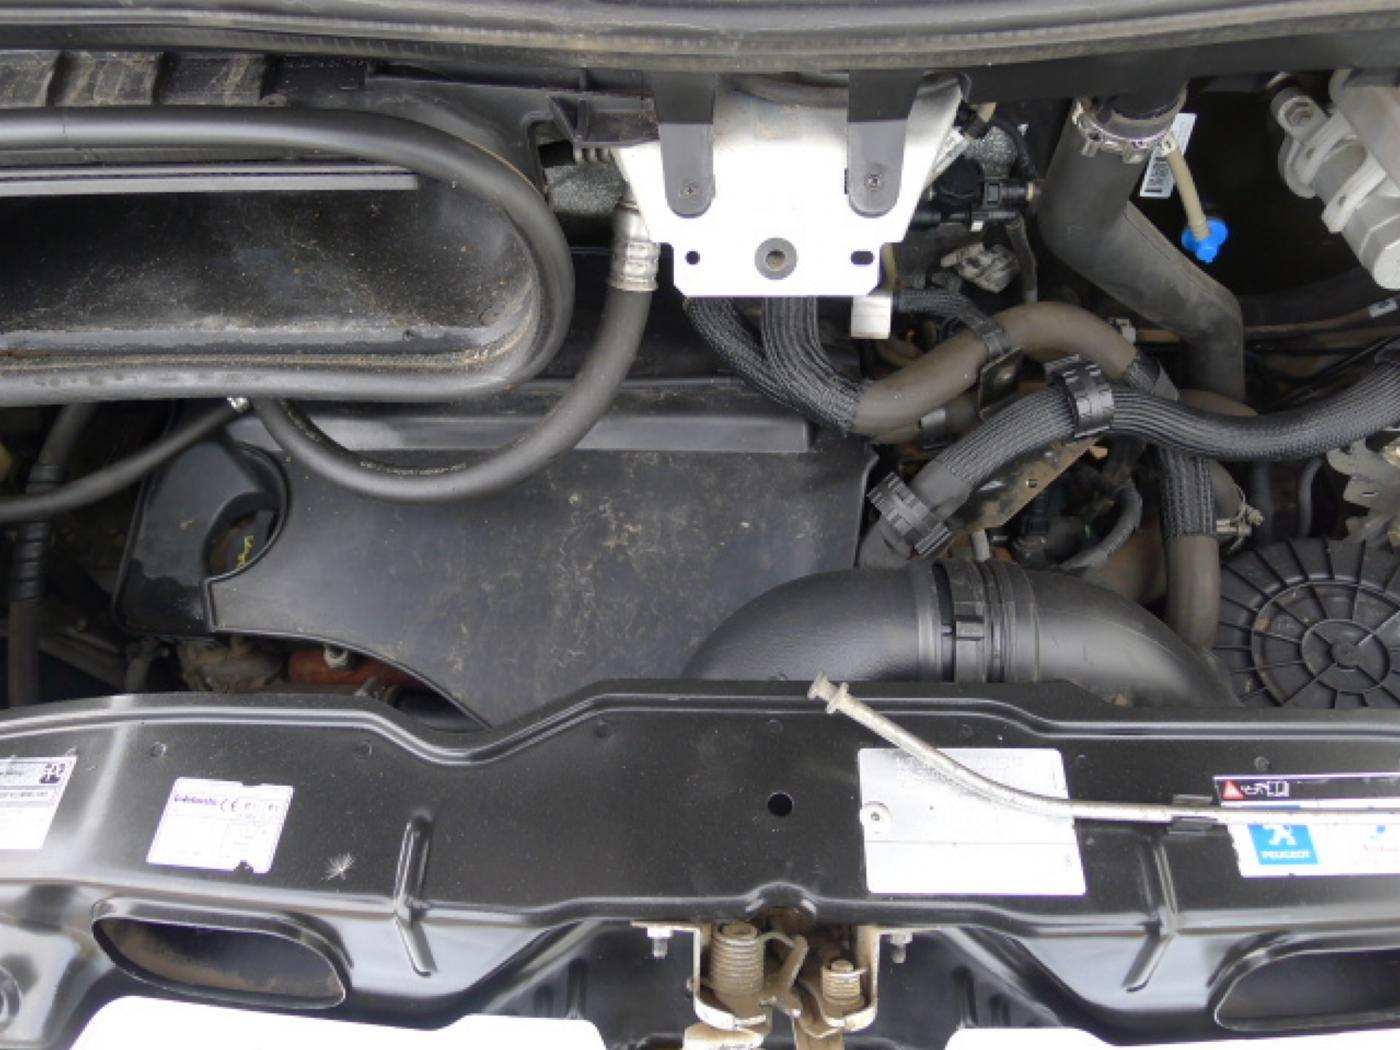 Peugeot Boxer 2,2 HDI PANORAMA 8míst+2 x klima+We - 22